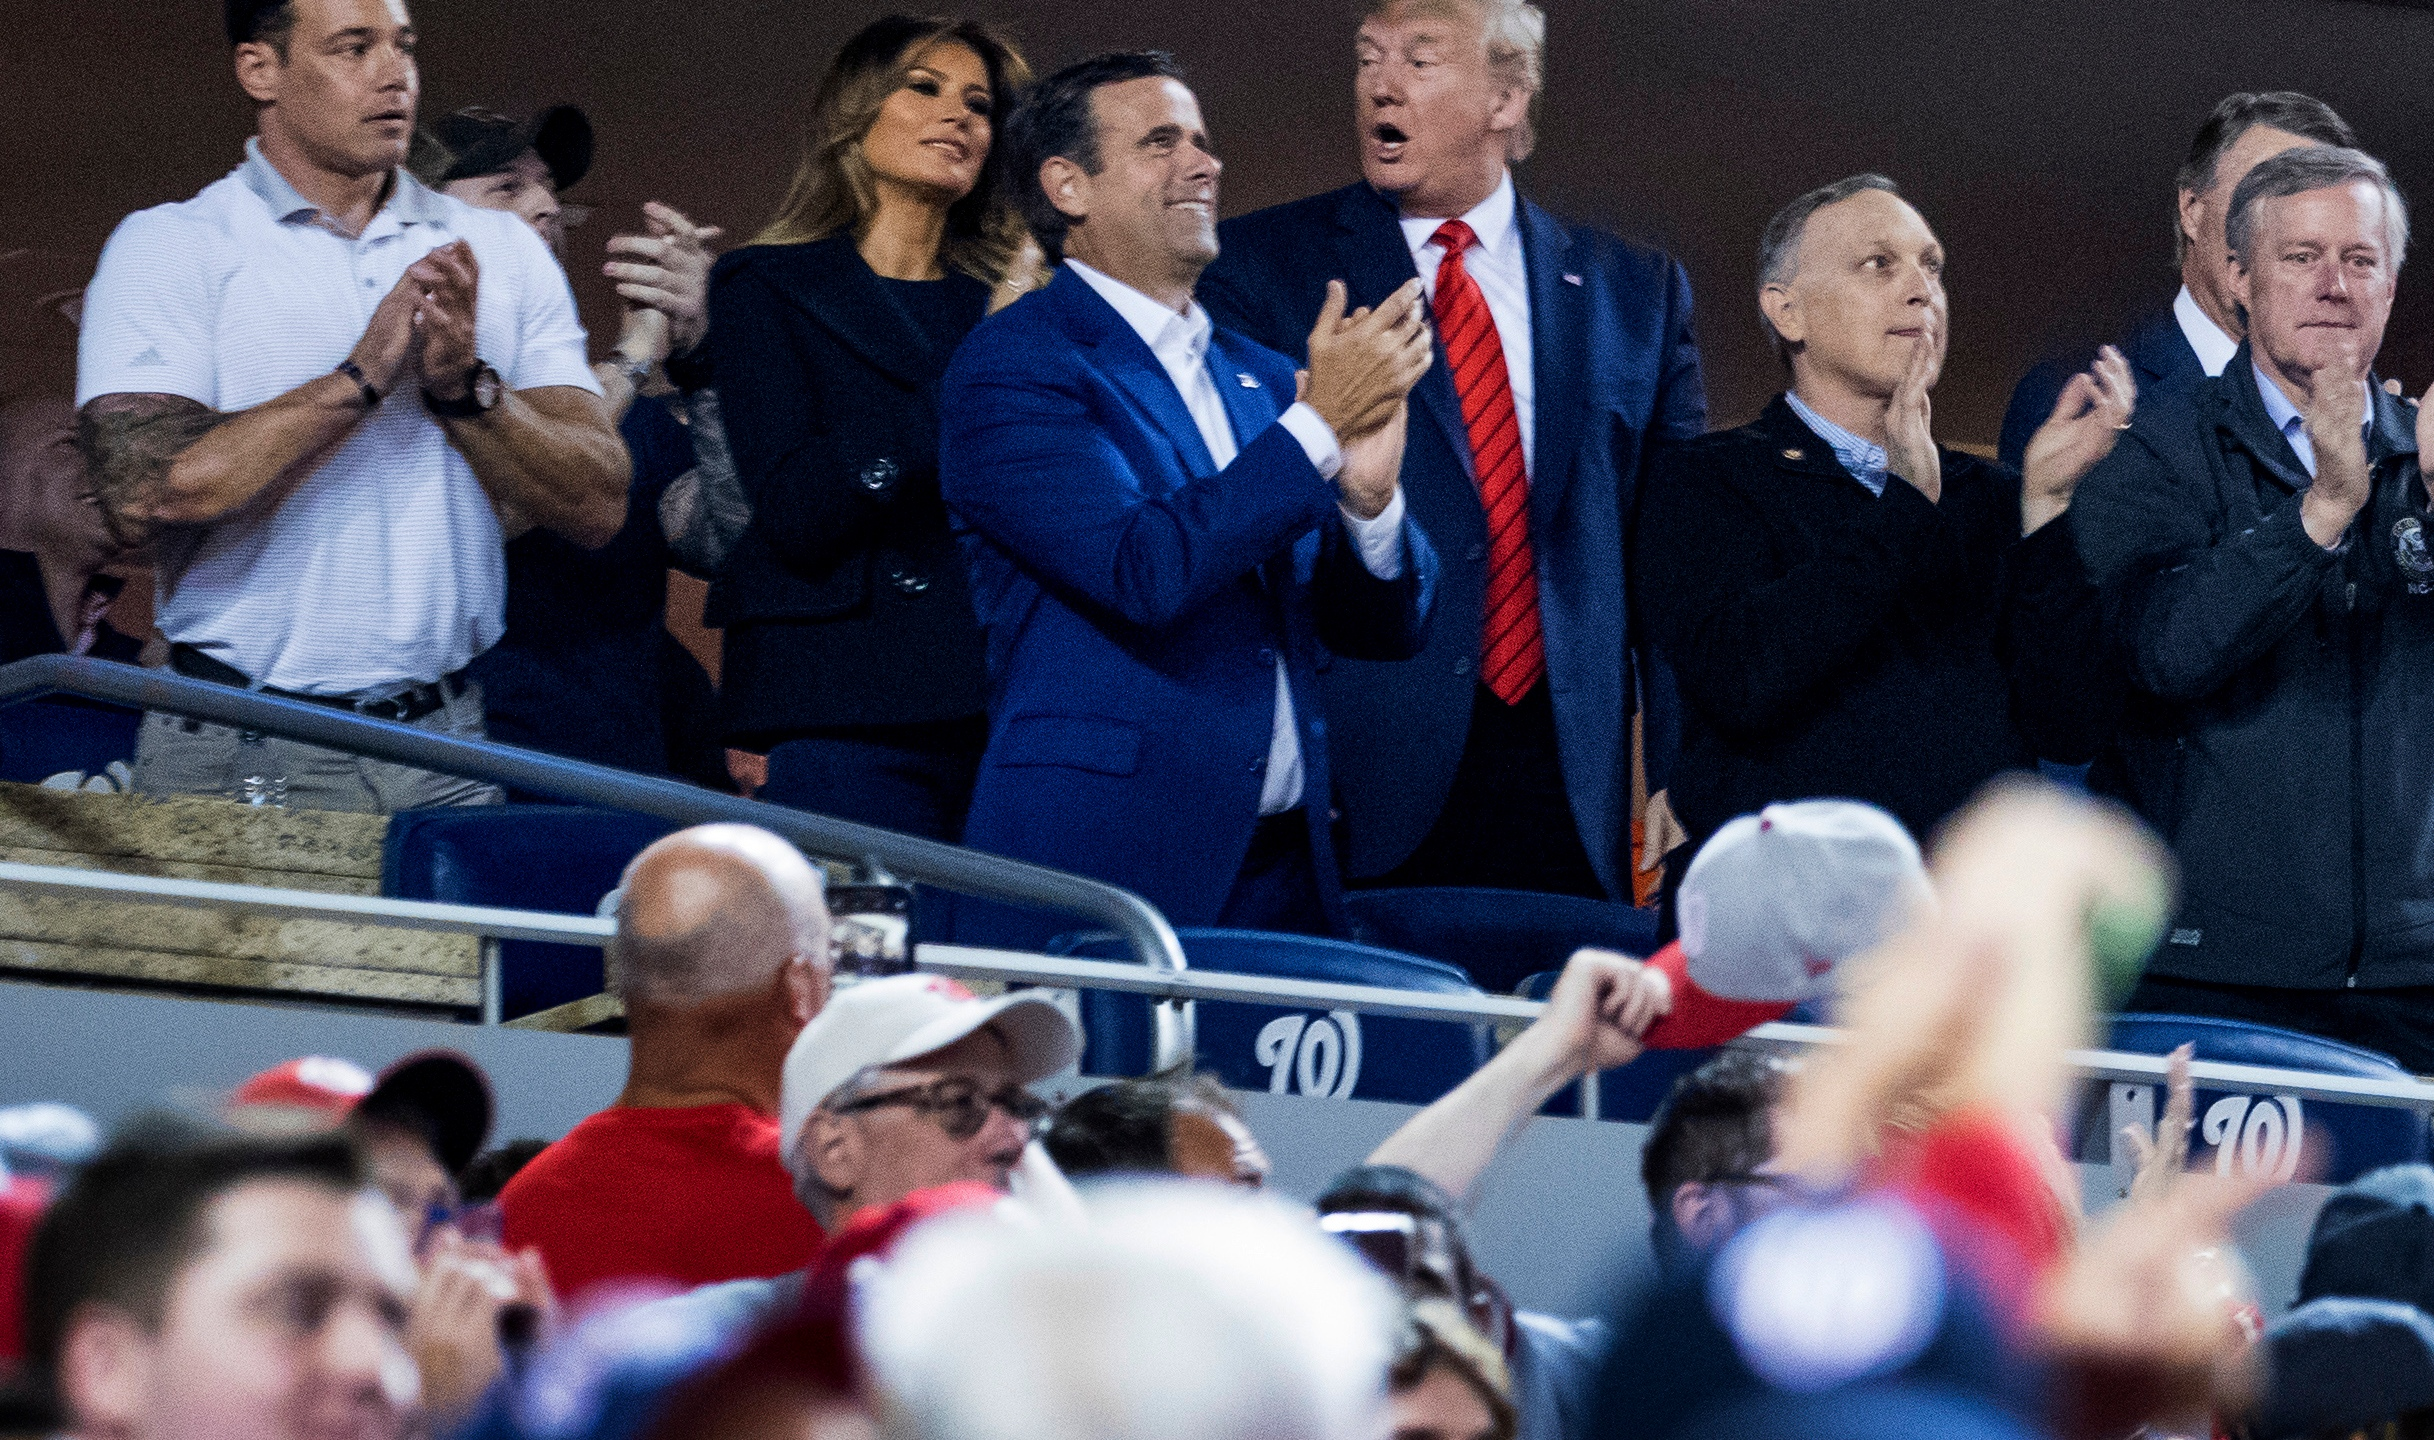 Donald Trump, Melania Trump, John Ratcliffe, Mark Meadows